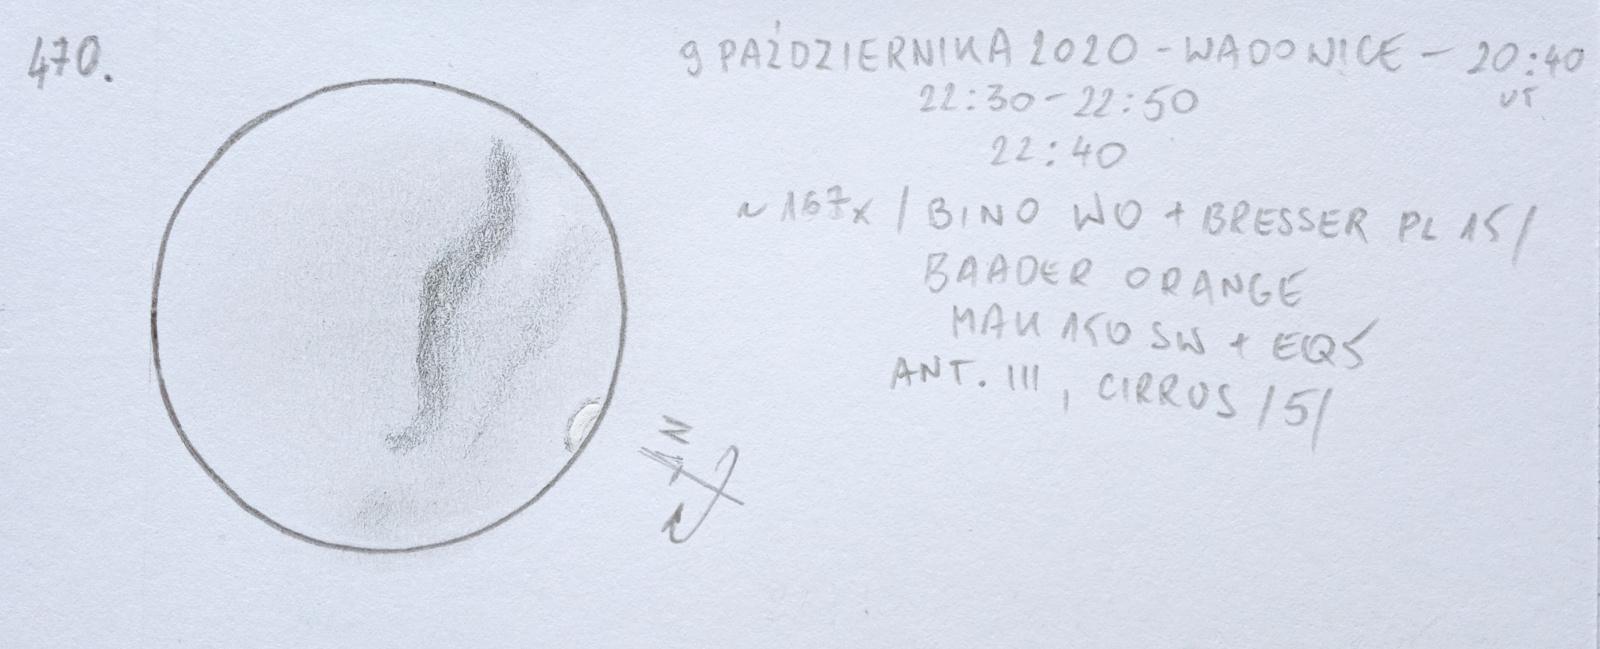 IMG_20201011_122837.jpg